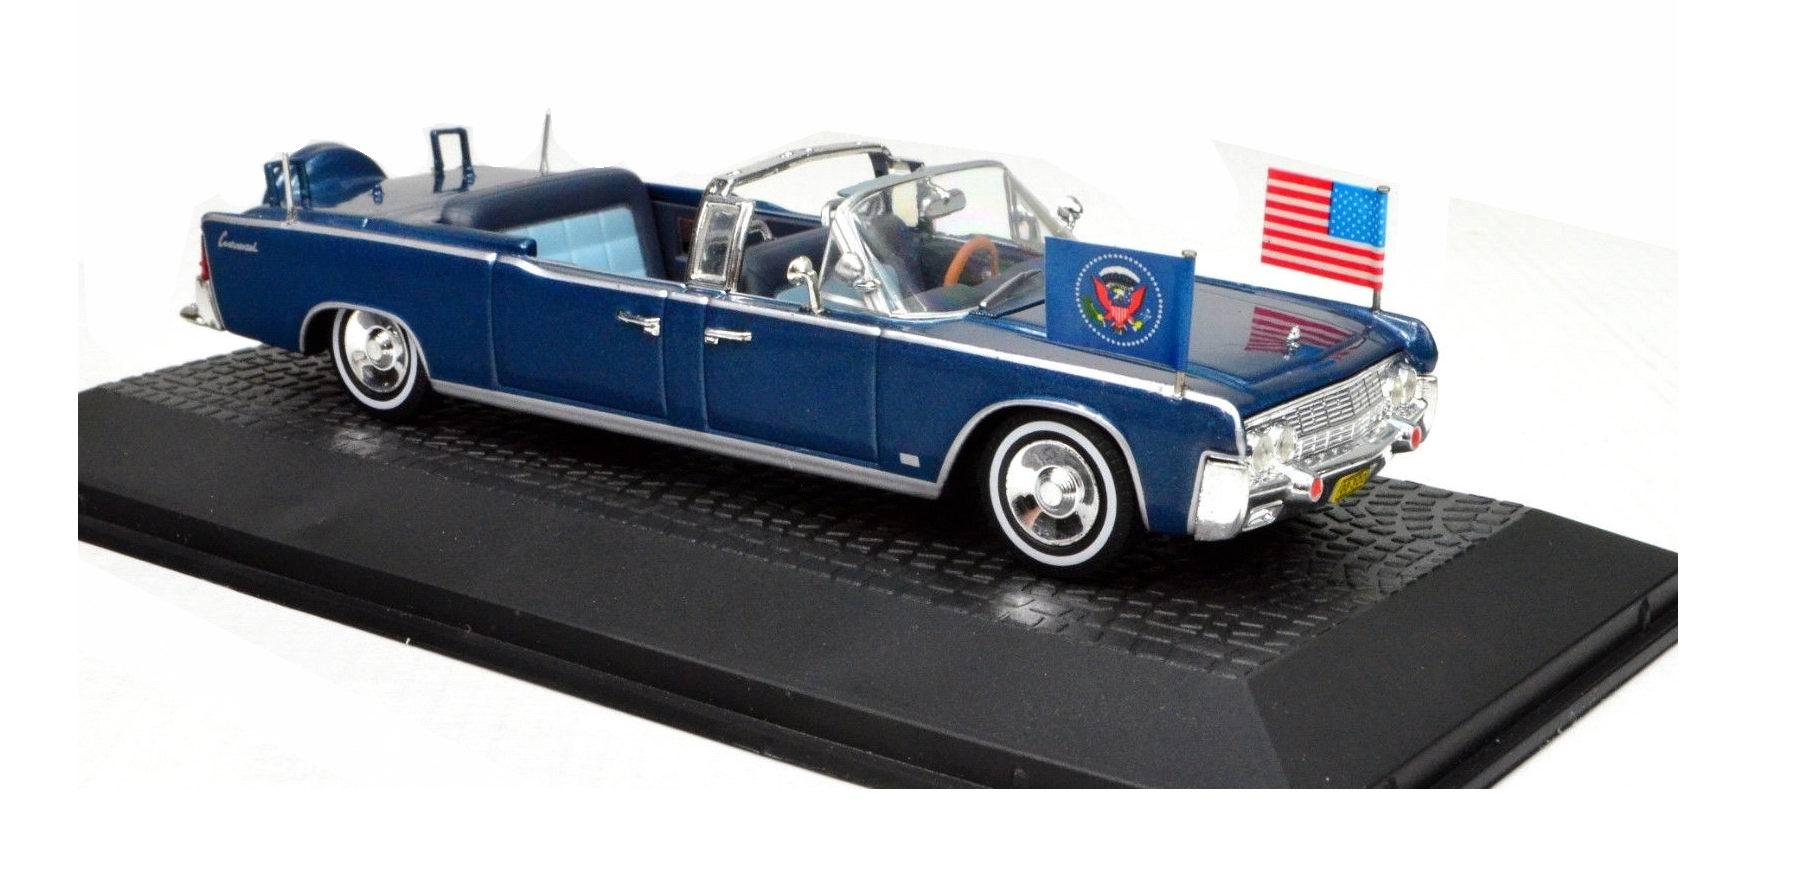 Voiture en métal Lincoln CONTINENTAL cabriolet SS-100-X Voiture Présidentielle JFK Kennedy 1/43